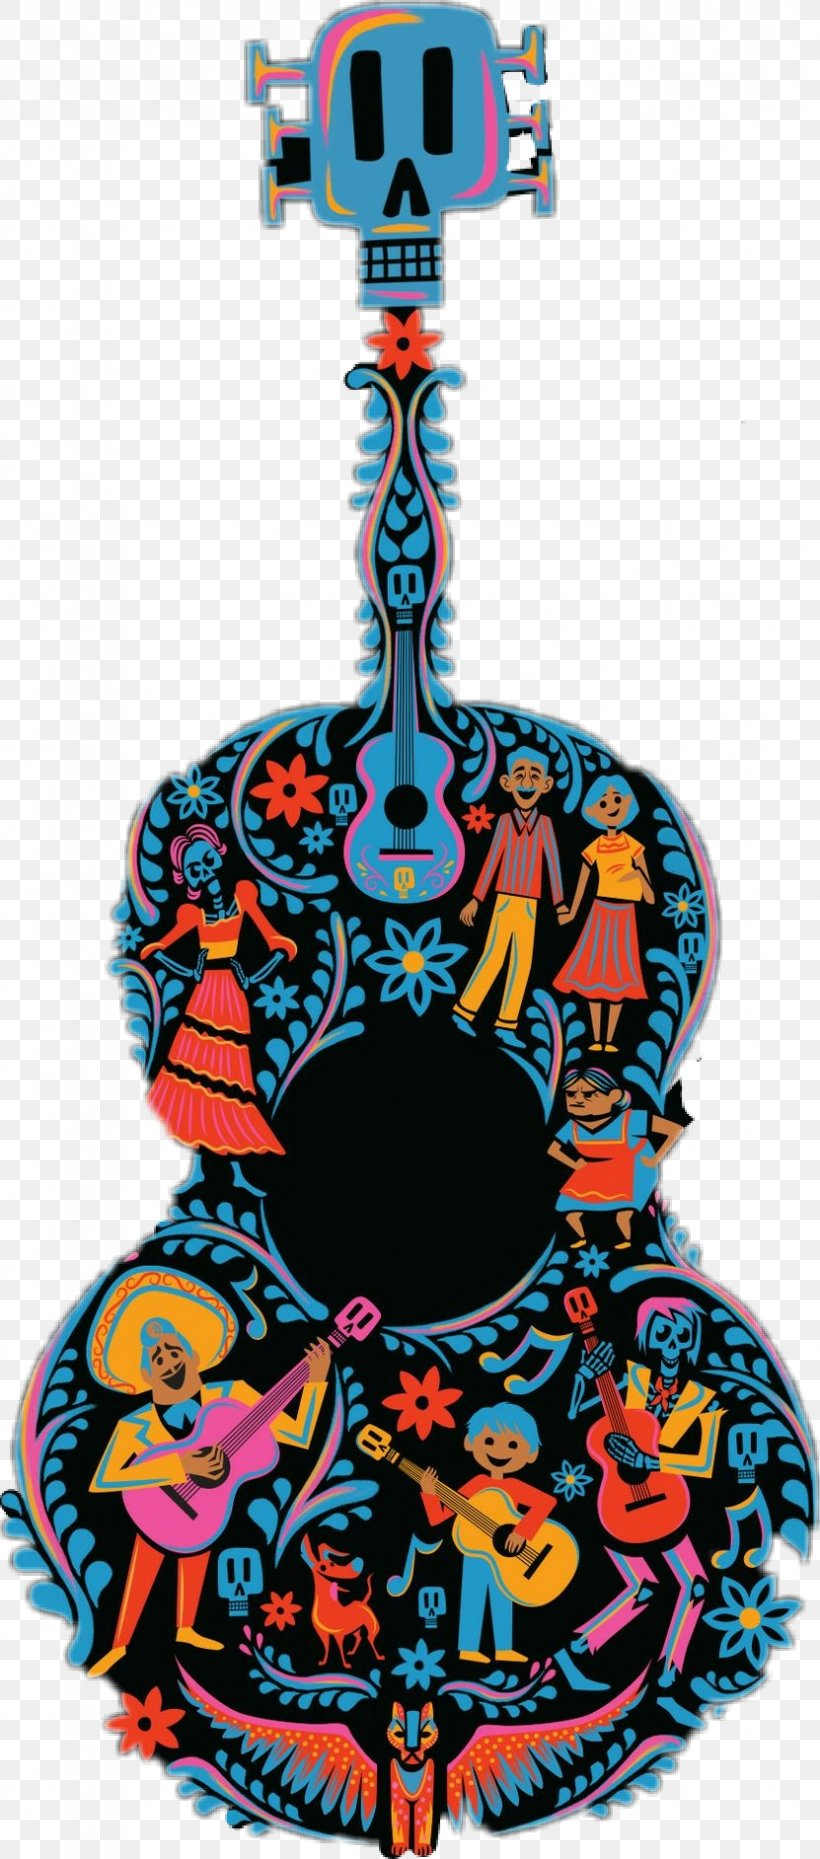 Pixar Clip Art Coco Guitar Pattern Kids\' T.